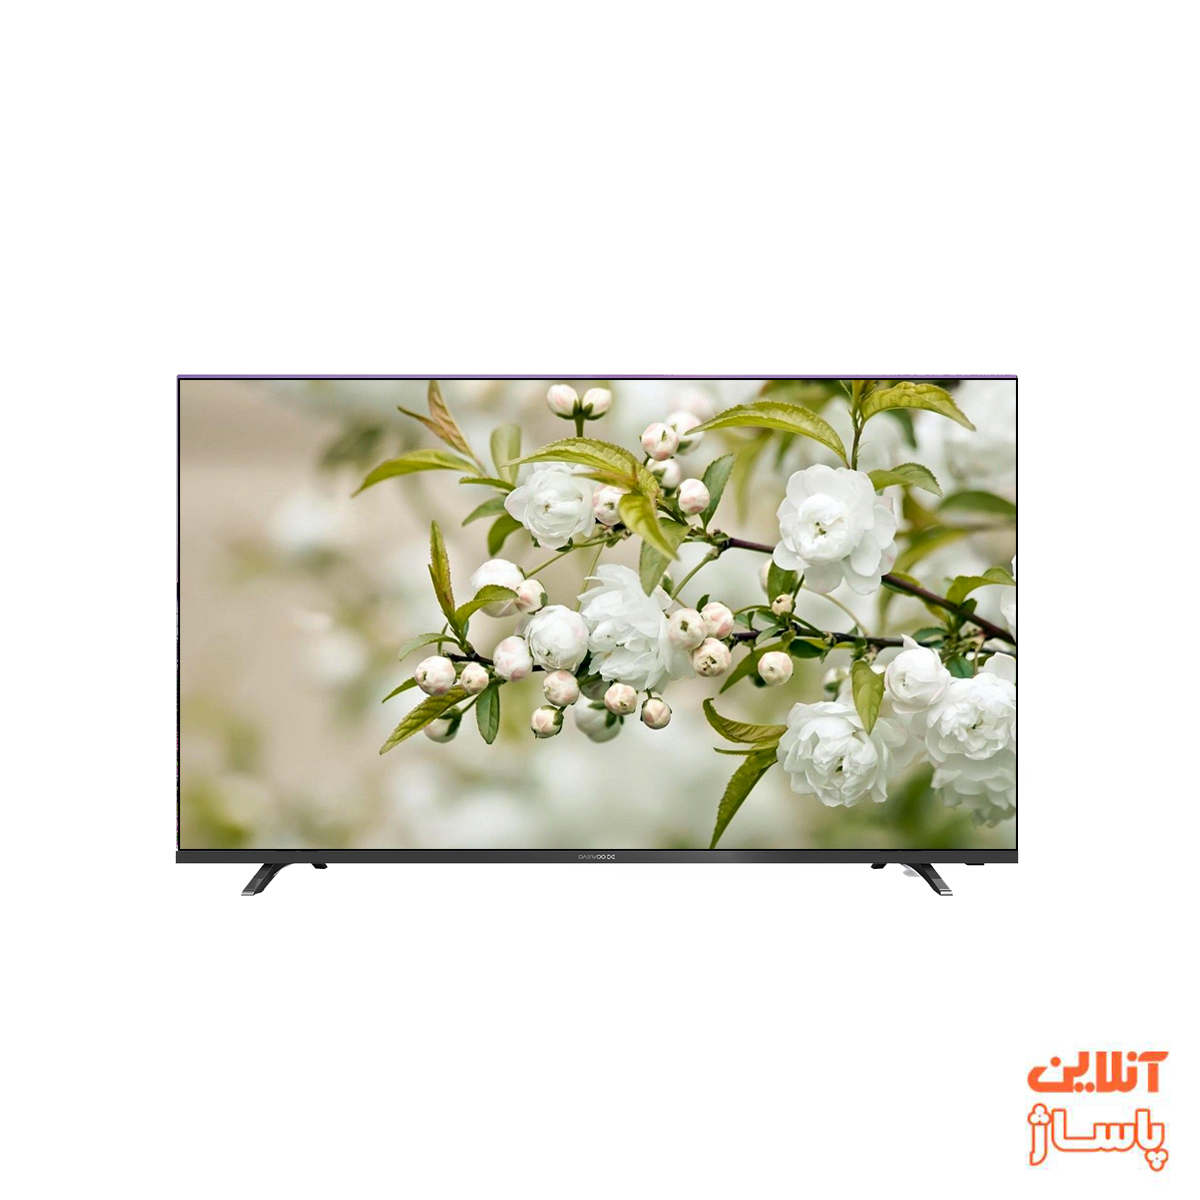 تلویزیون ال ای دی دوو مدل DLE-50K4300U سایز 50 اینچ